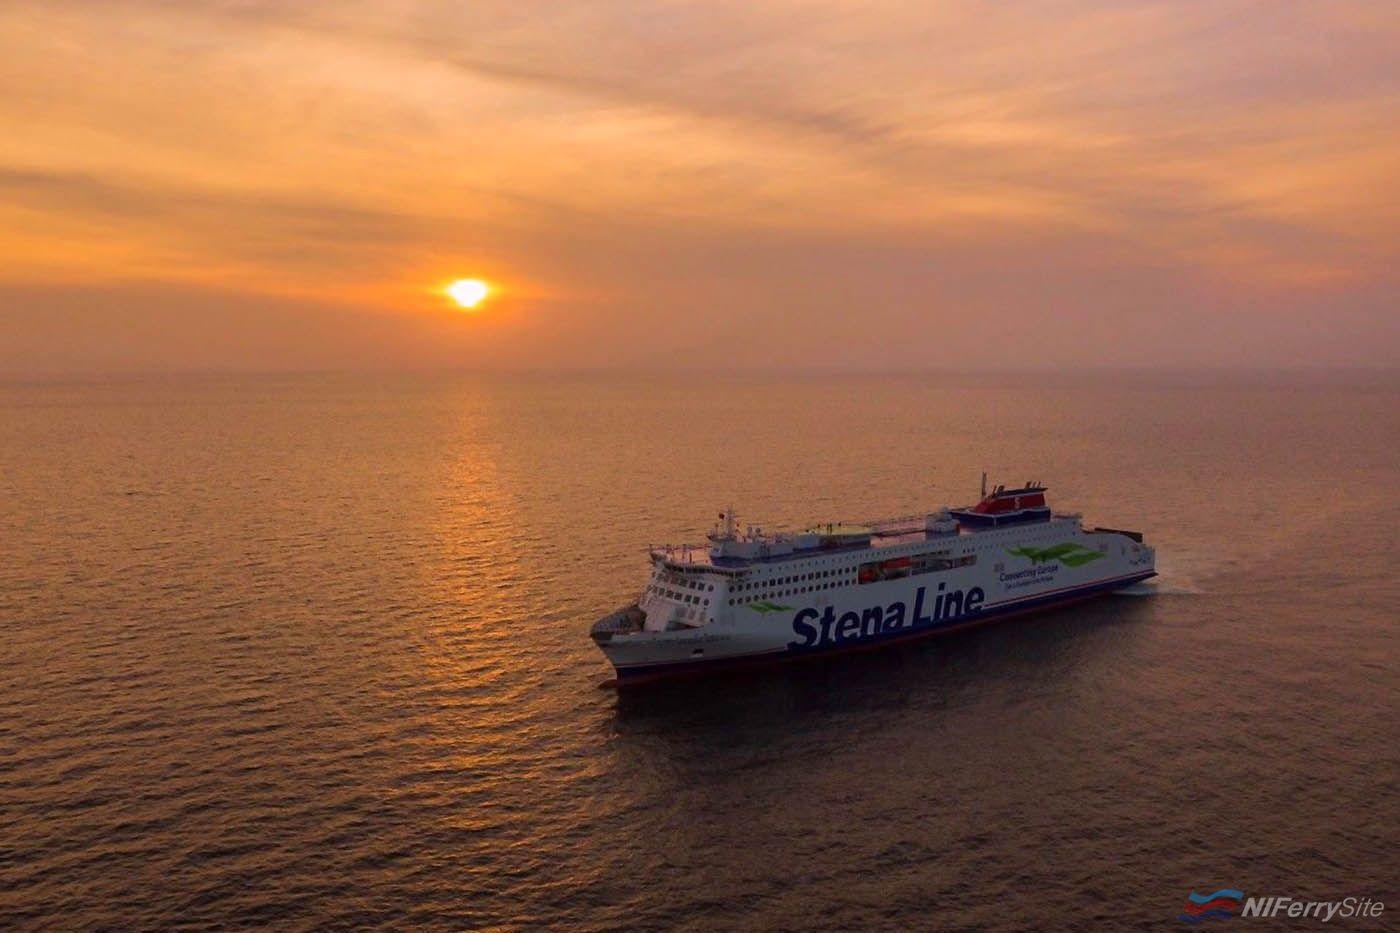 The sun sets on STENA ESTRID, during her sea trials. China Merchants (video screenshot)